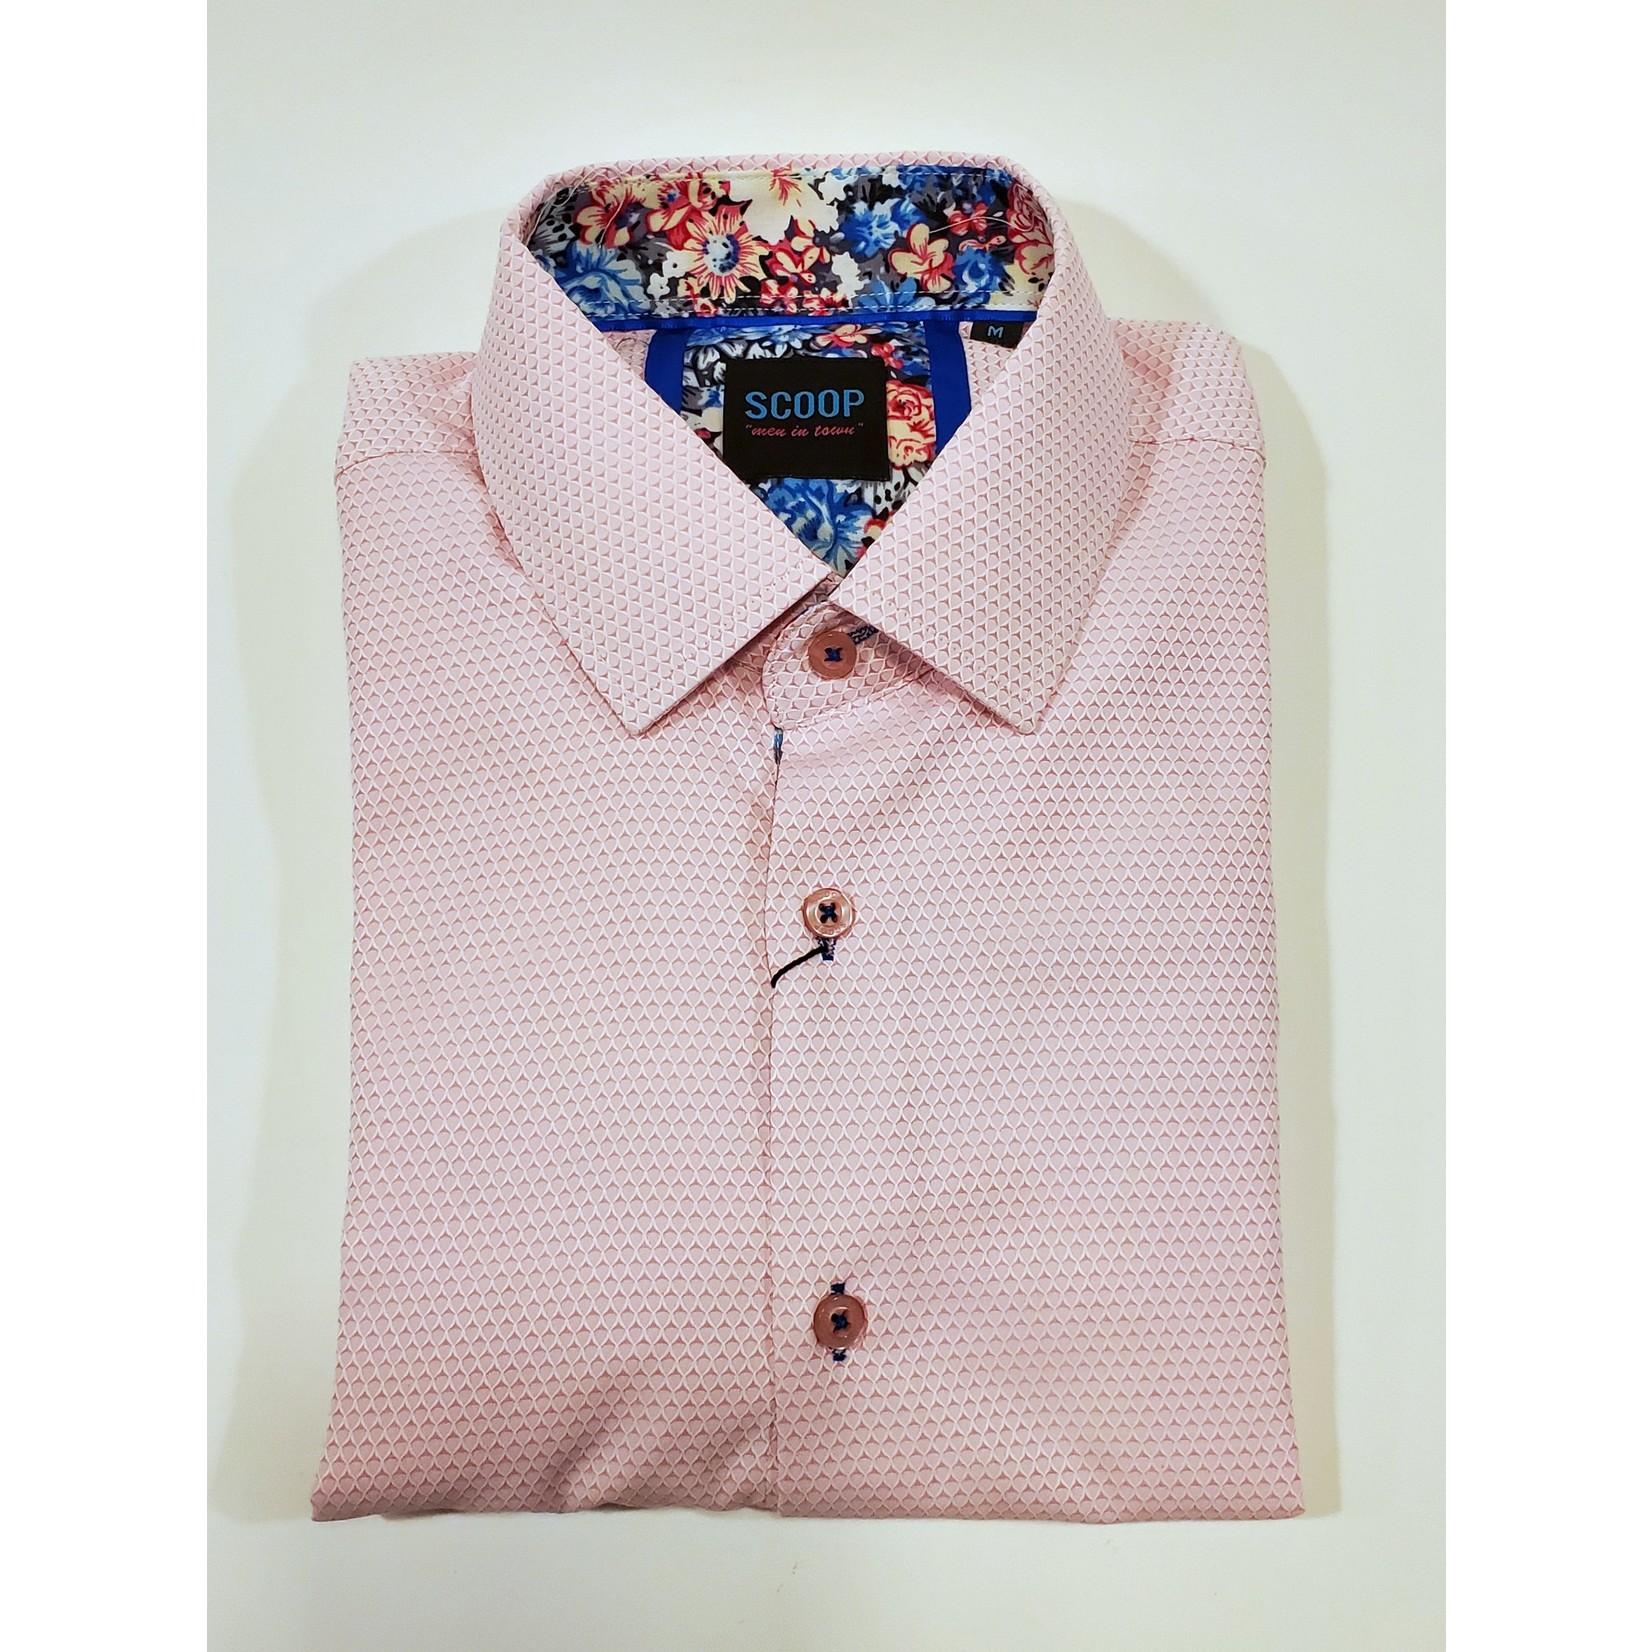 Scoop Steve Short-Sleeve Shirt